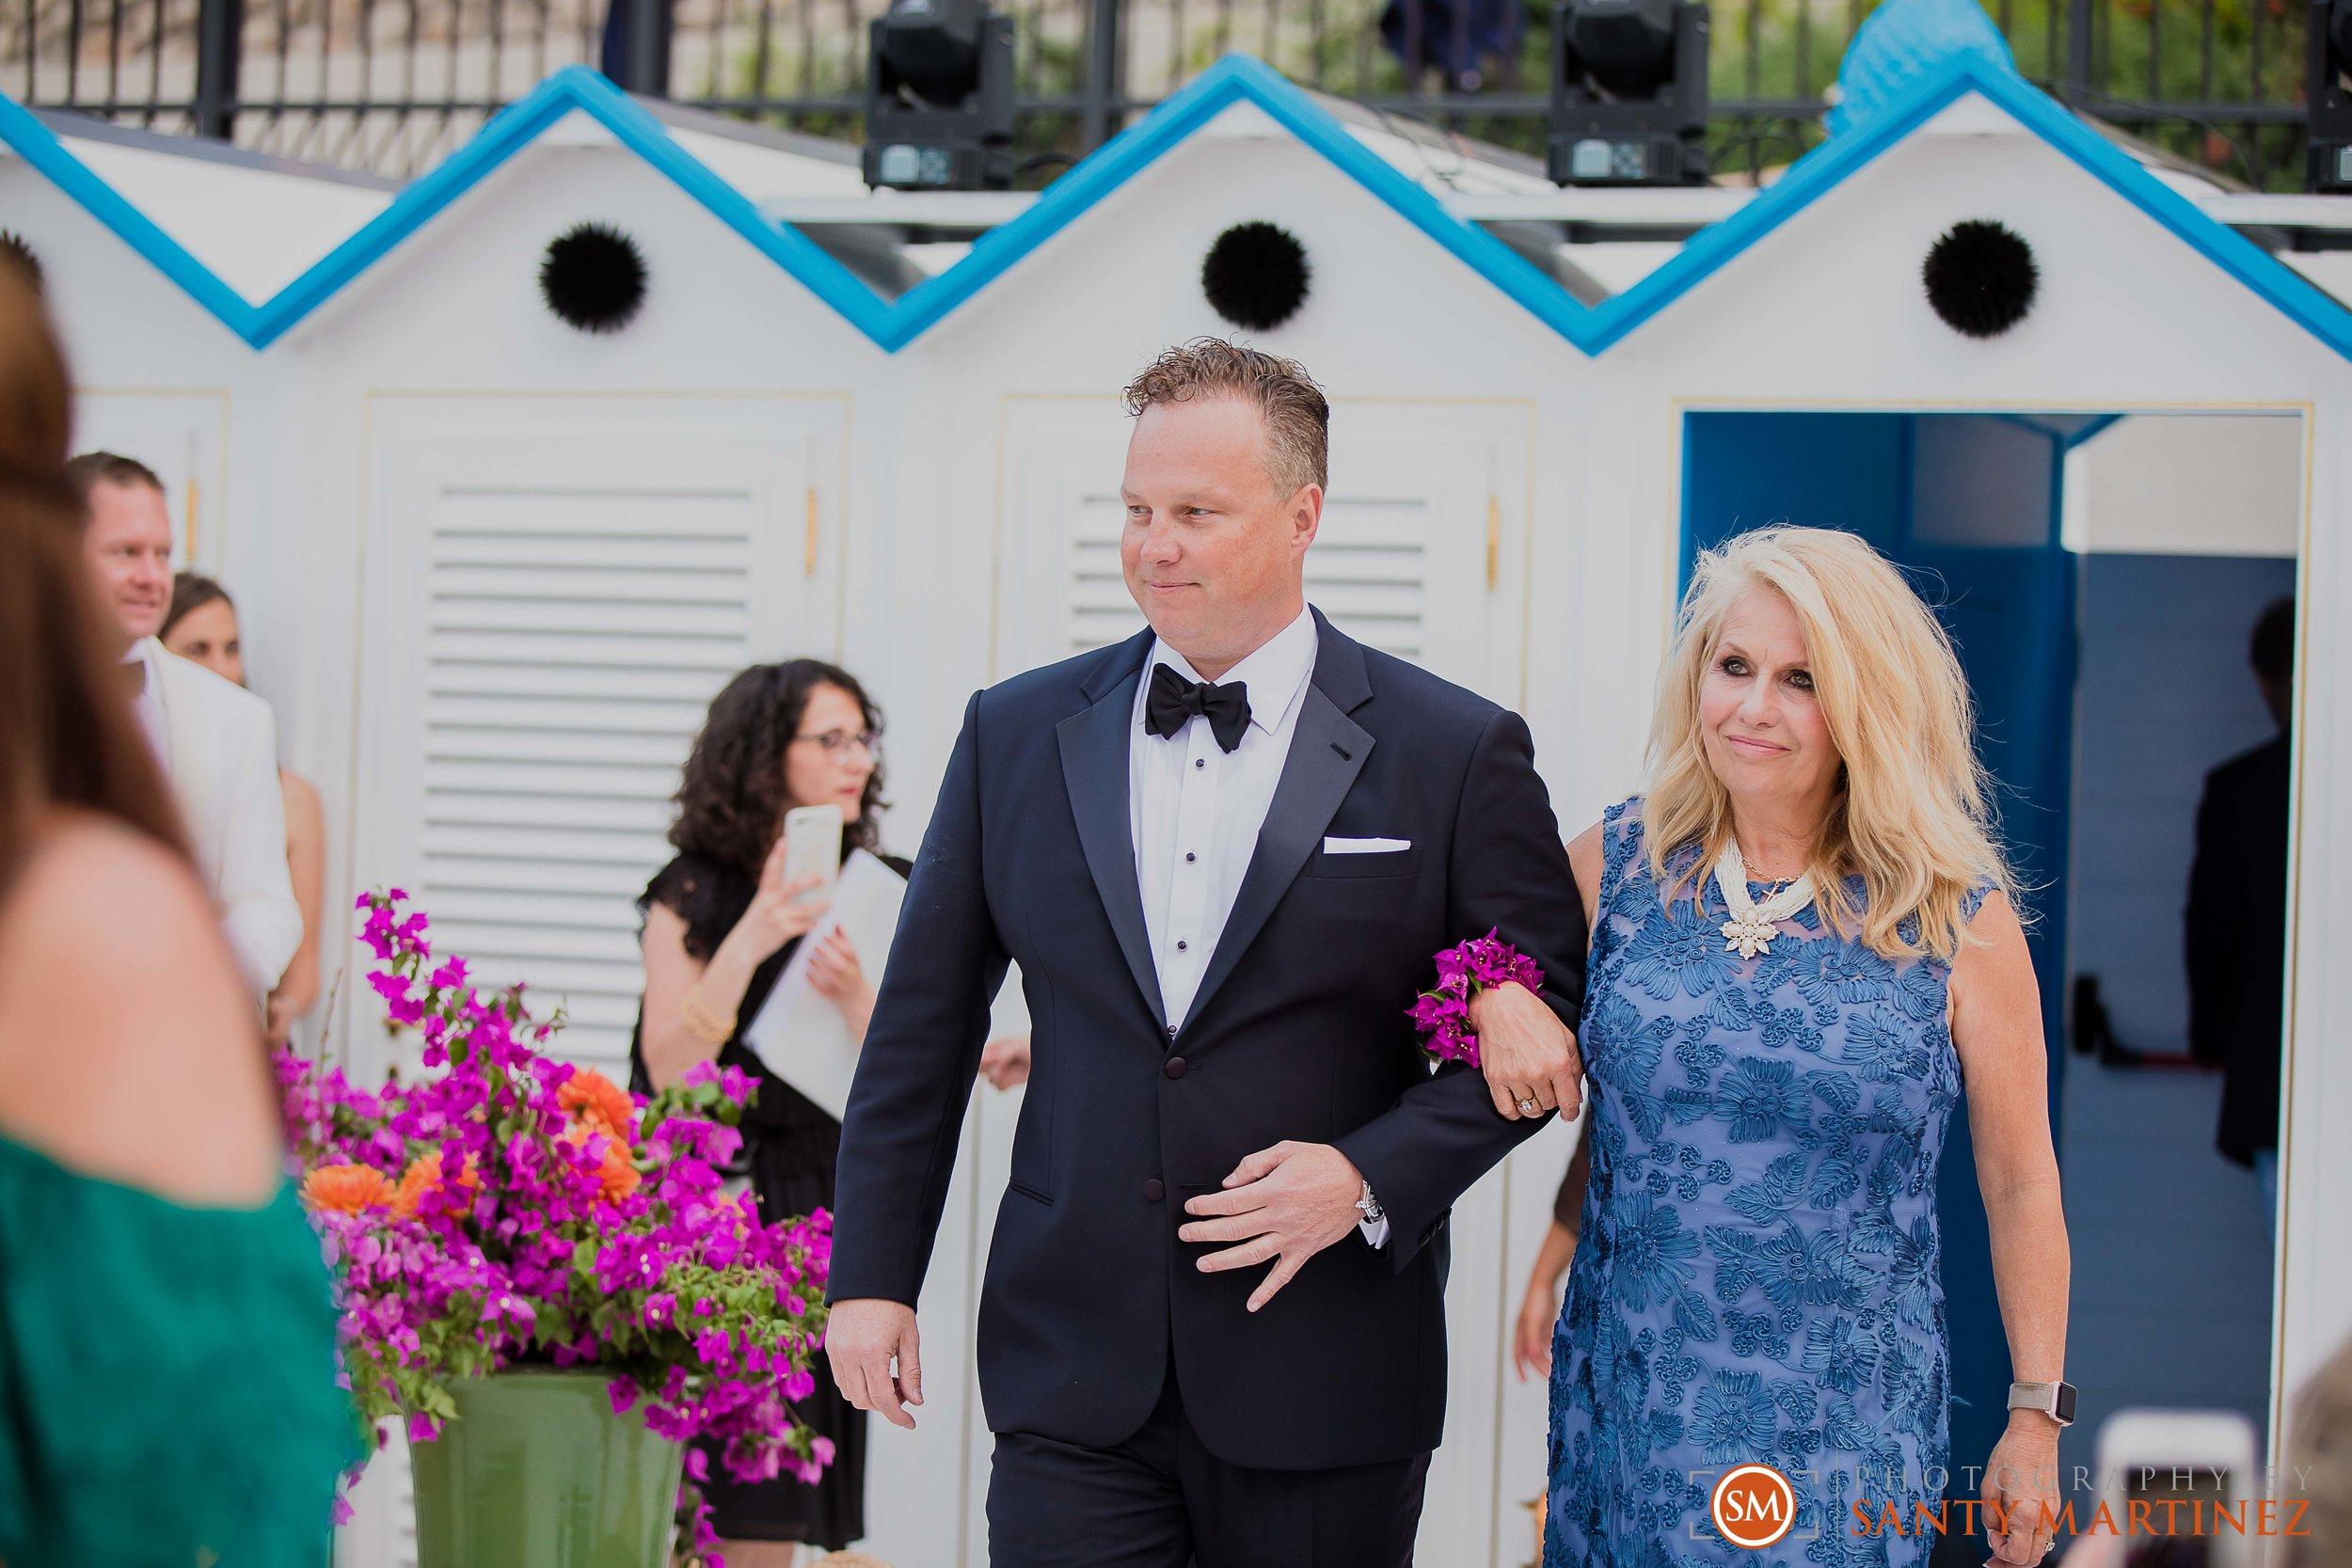 Wedding Capri Italy - Photography by Santy Martinez-48.jpg